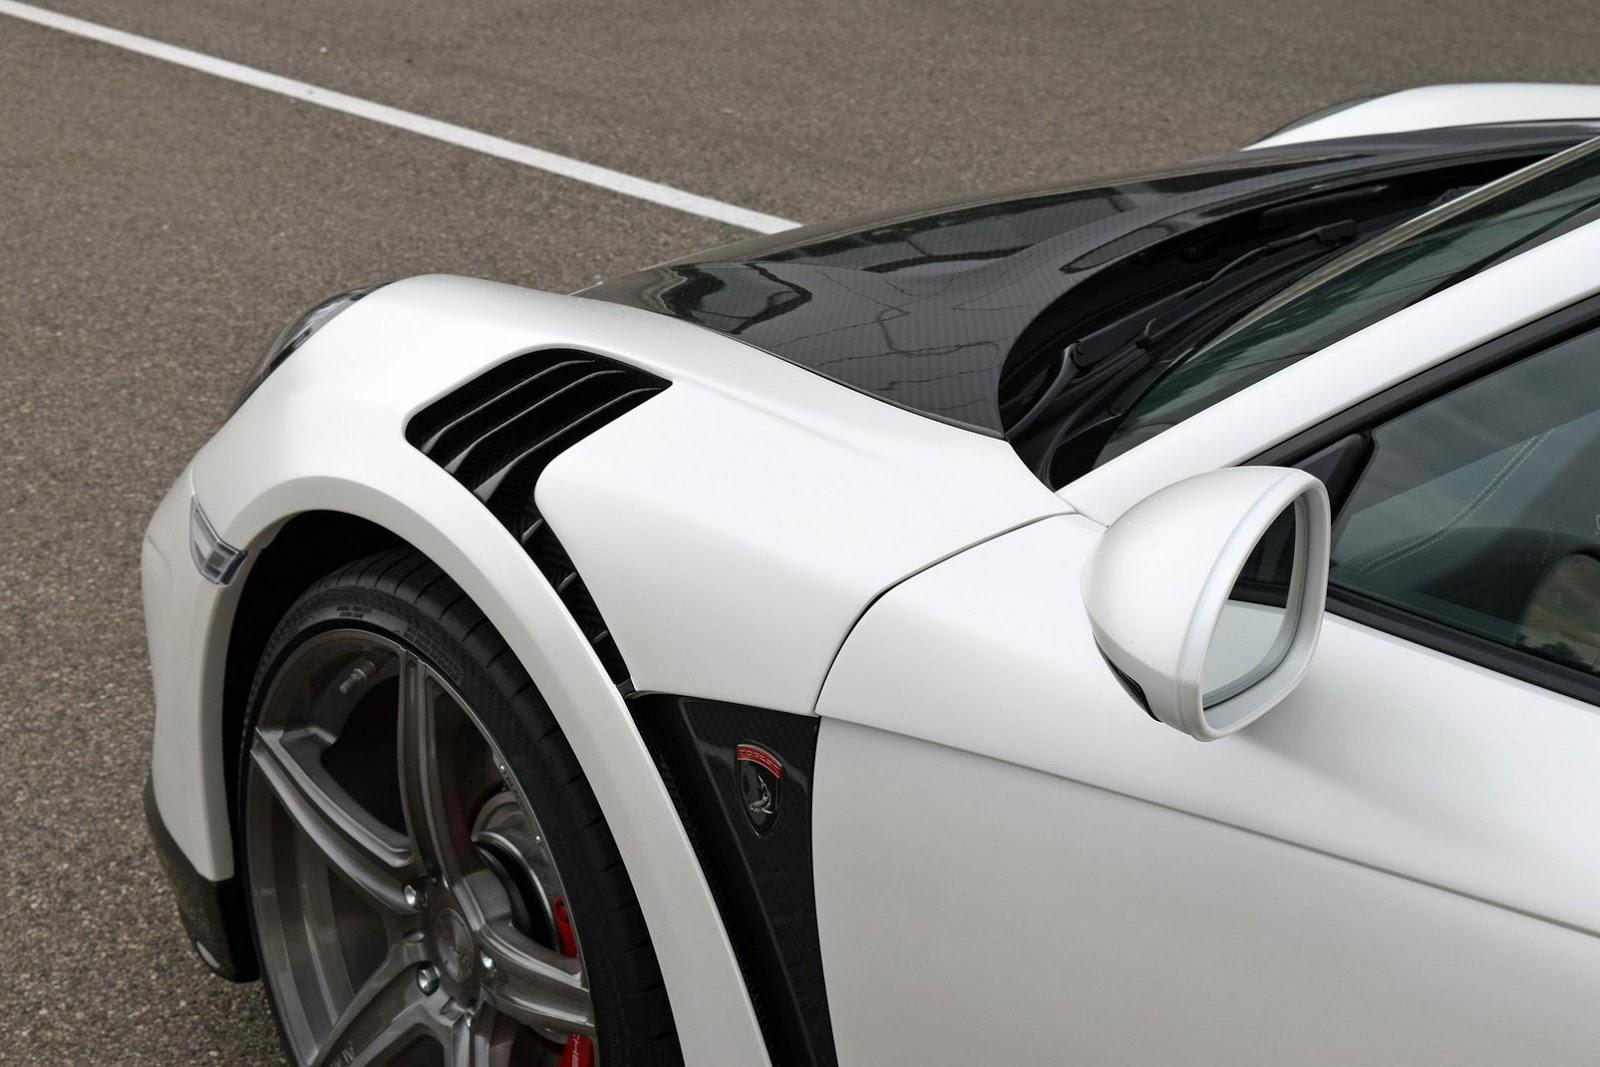 Topcar_Stinger_GTR_2_White_Pearl_16